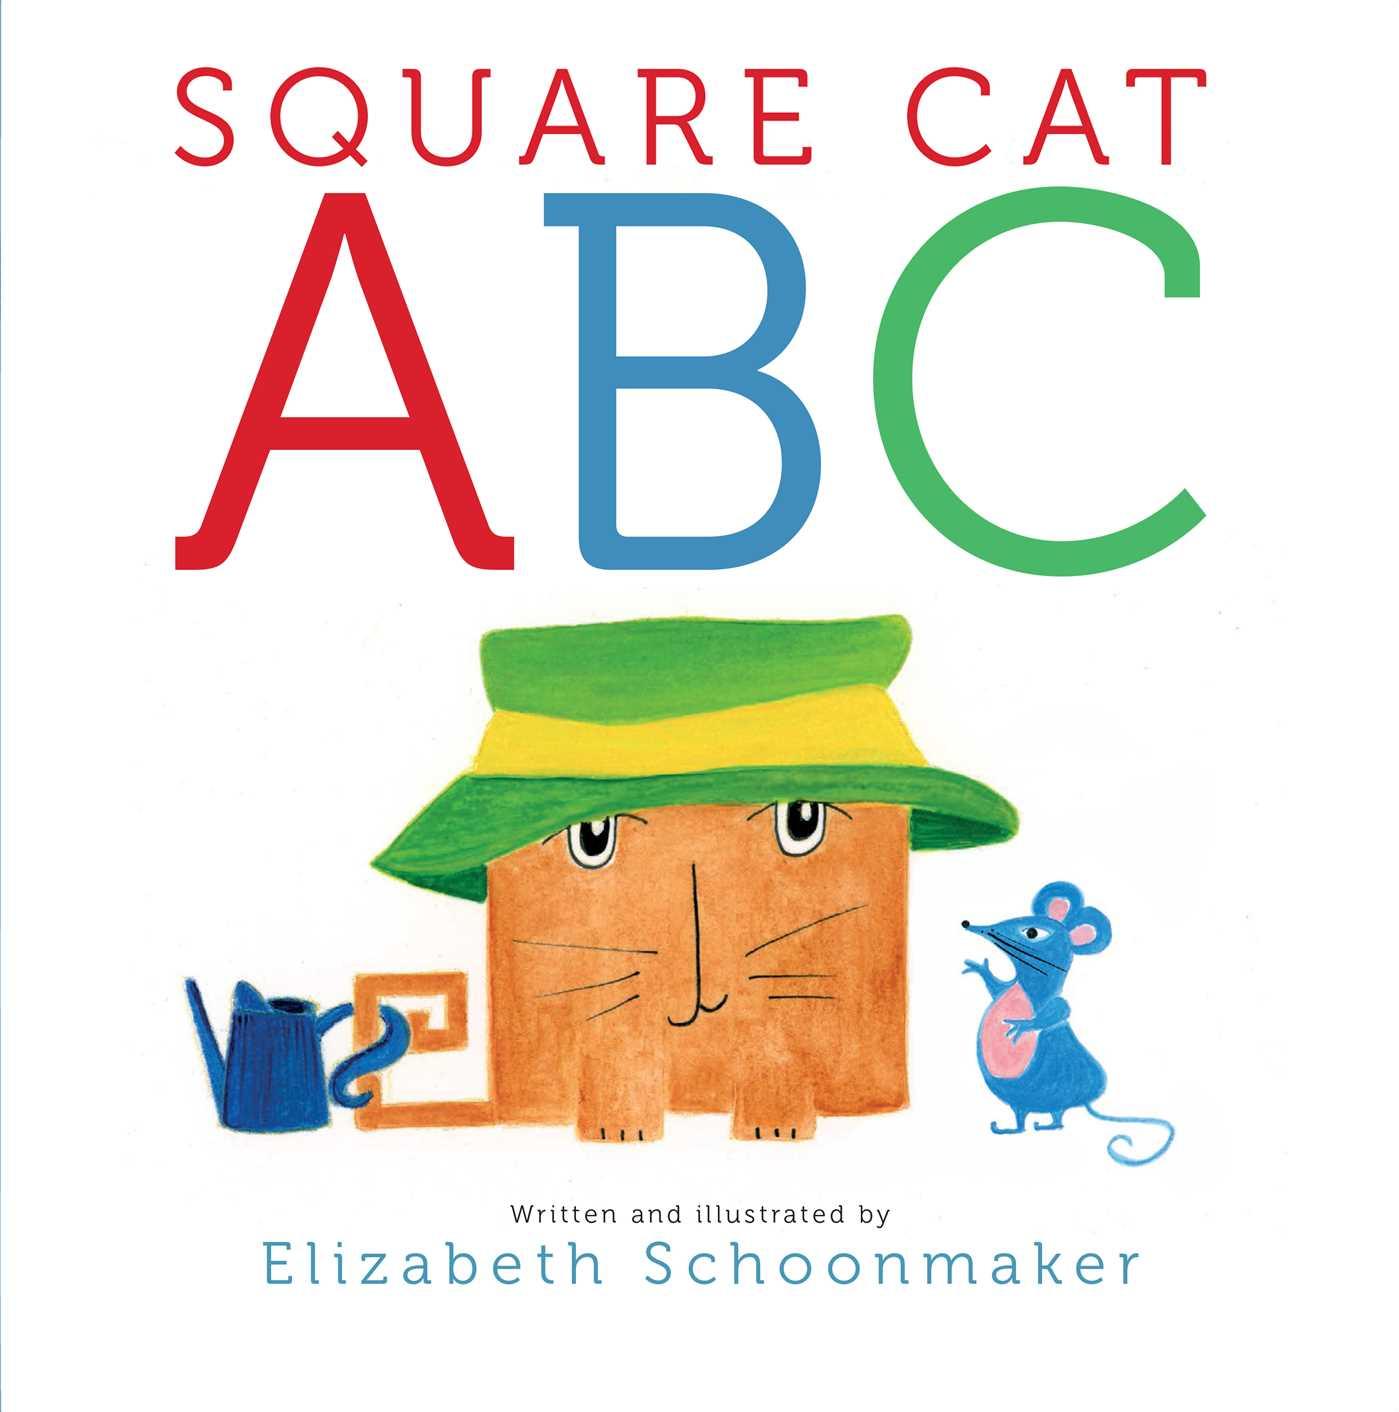 Square Cat Abc Book By Elizabeth Schoonmaker Official